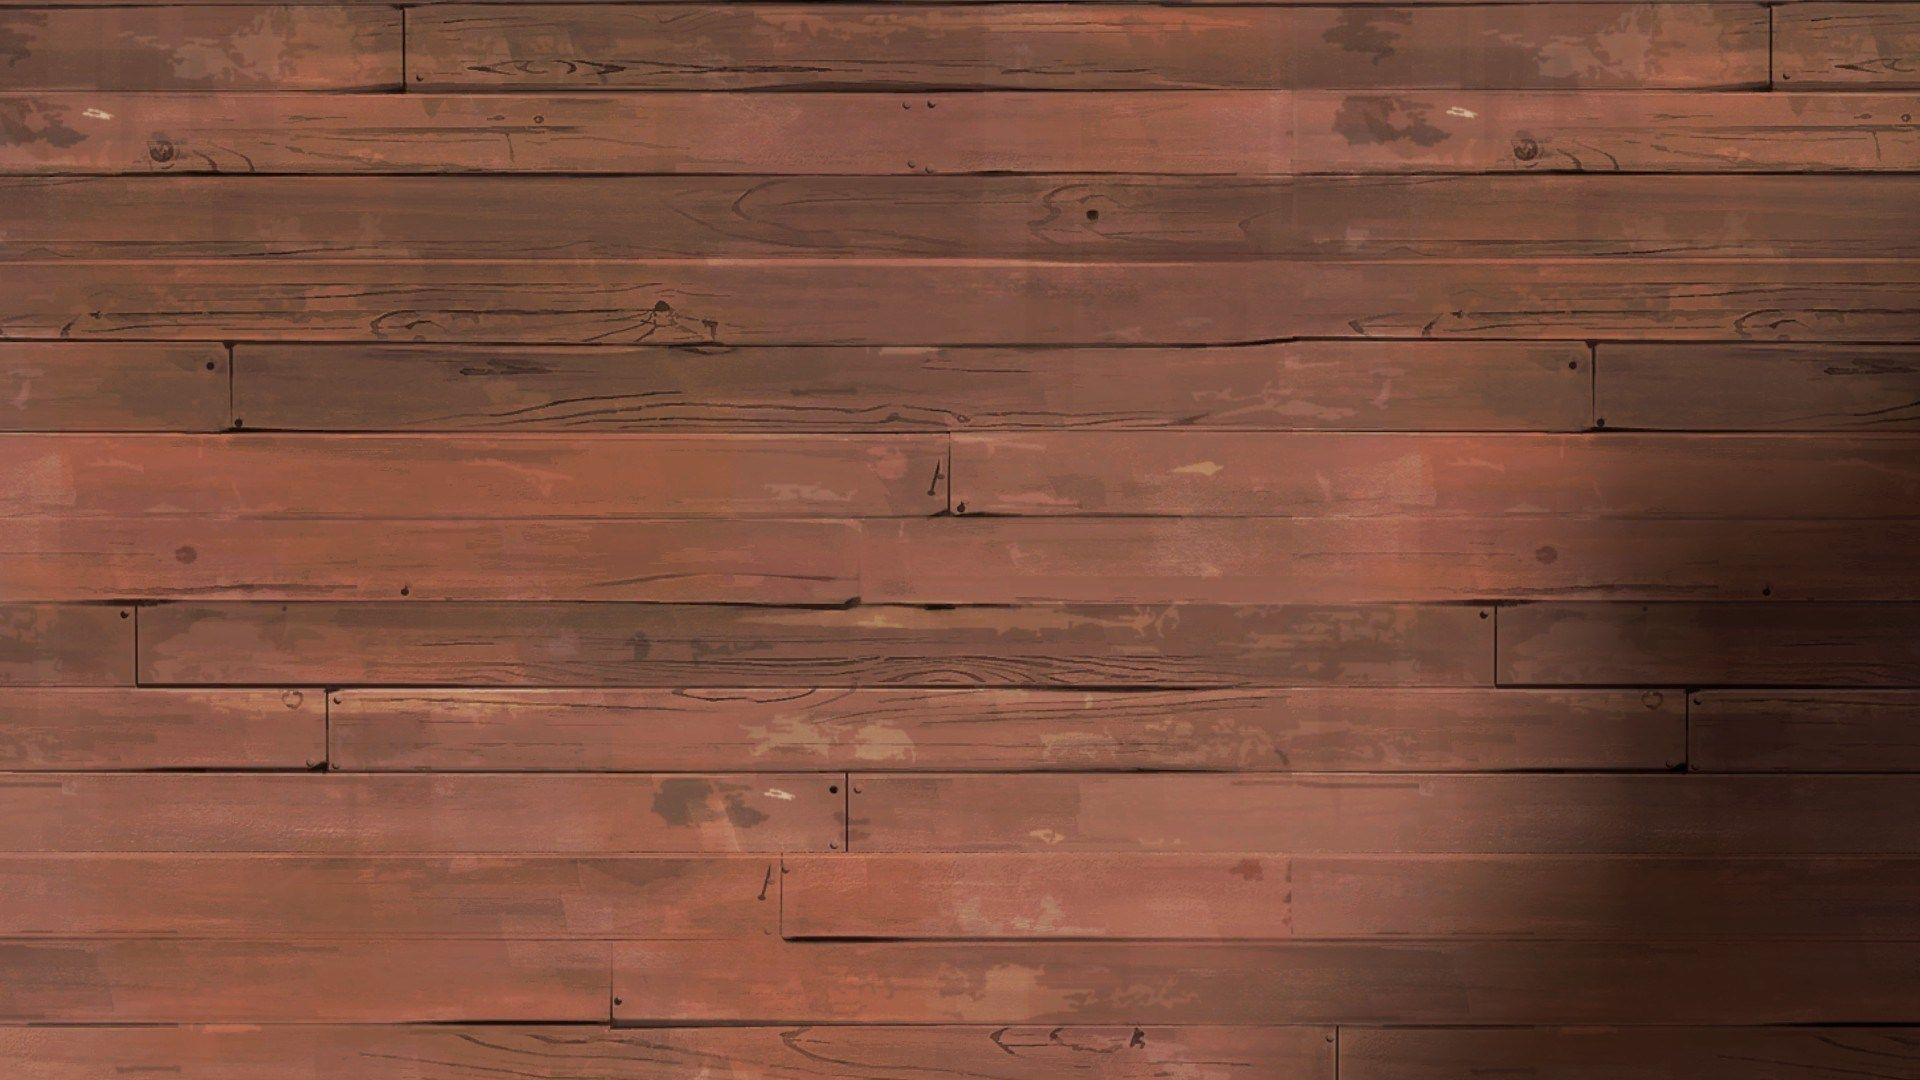 1920x1080 Wood Desktop Wallpaper Hd Wallpapers Jpg 286 Kb